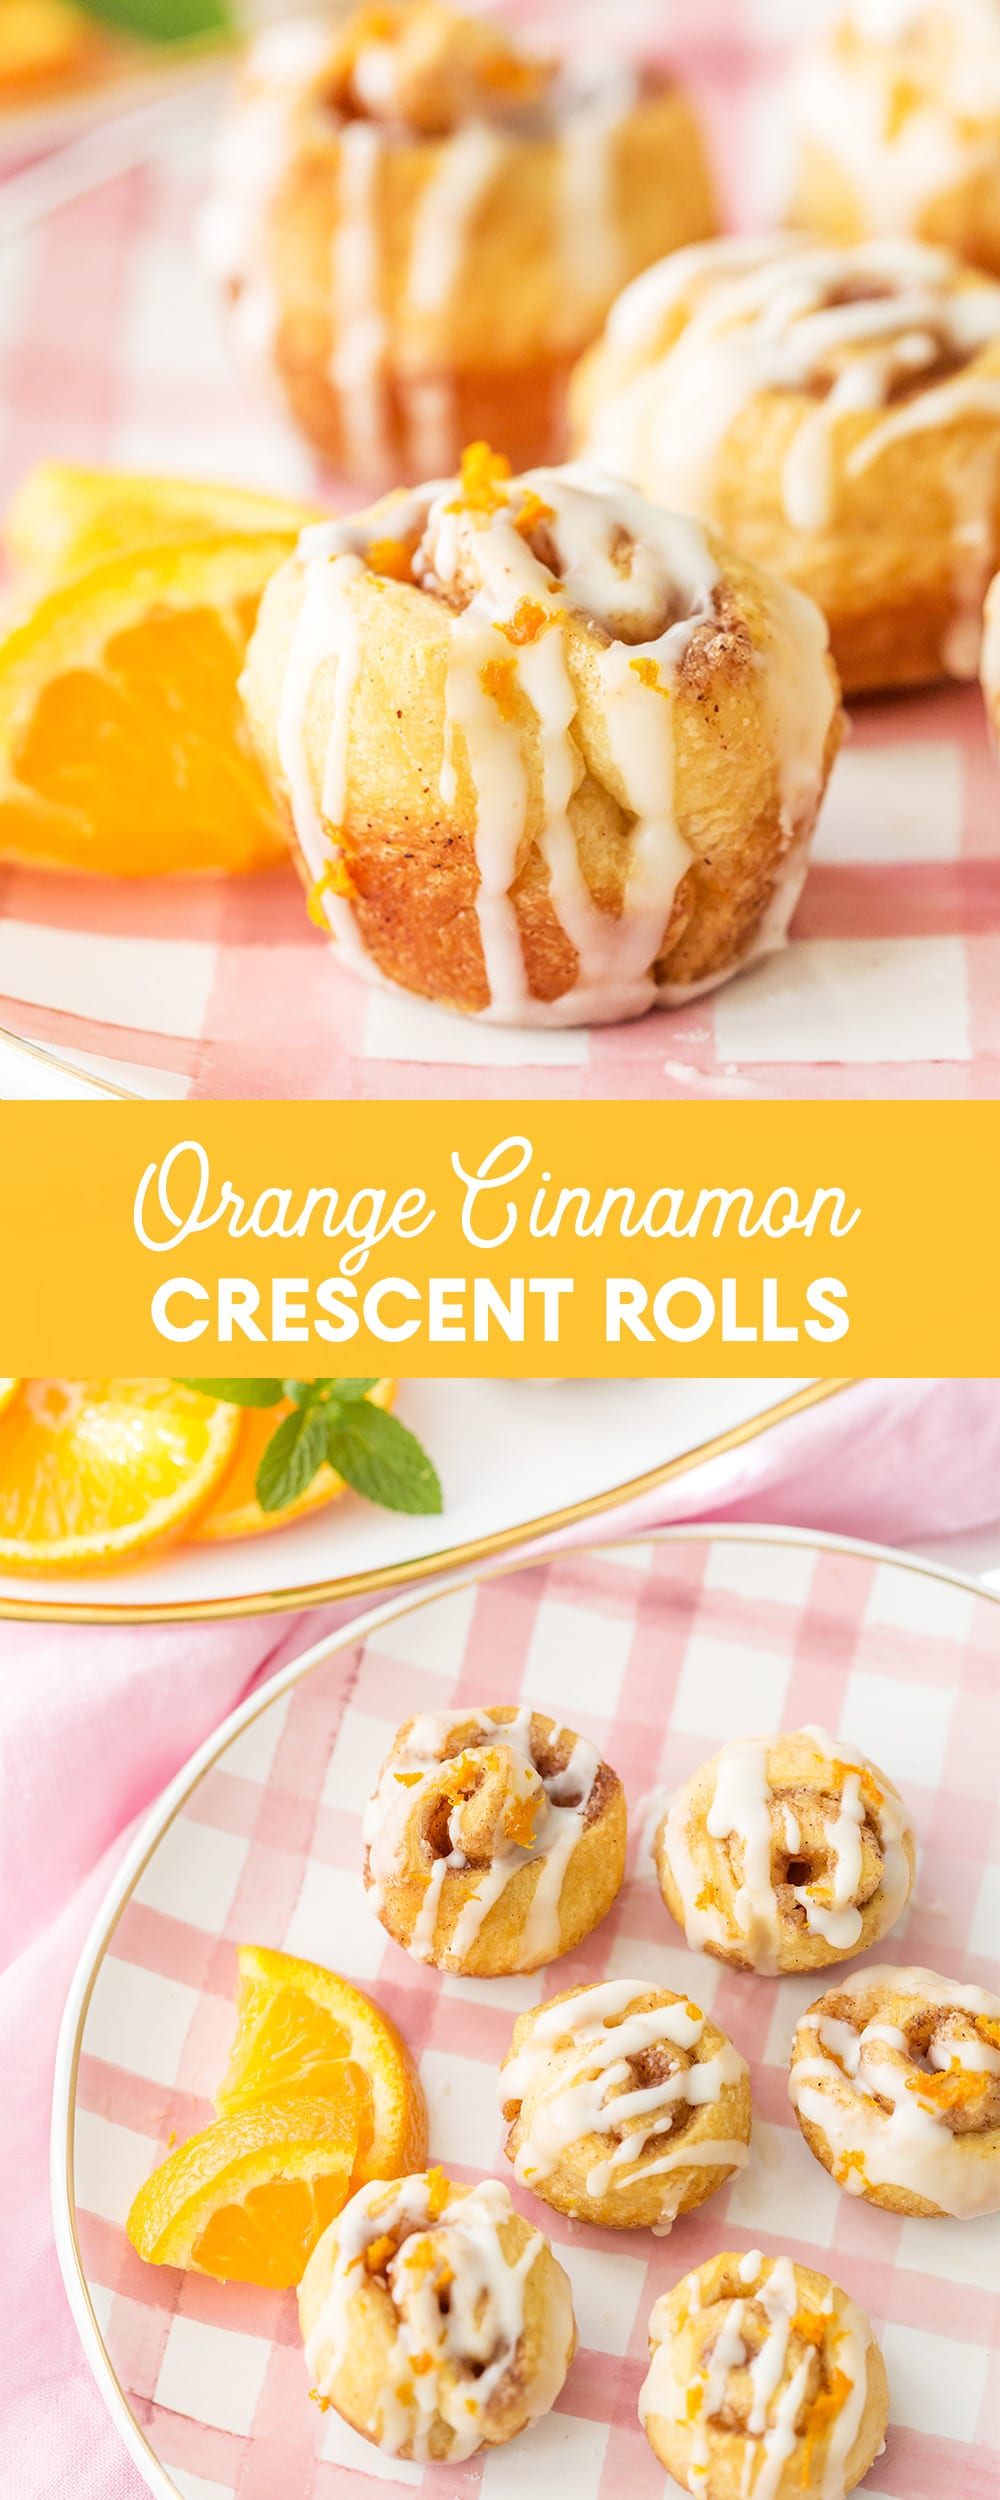 Orange Cinnamon Crescent Rolls